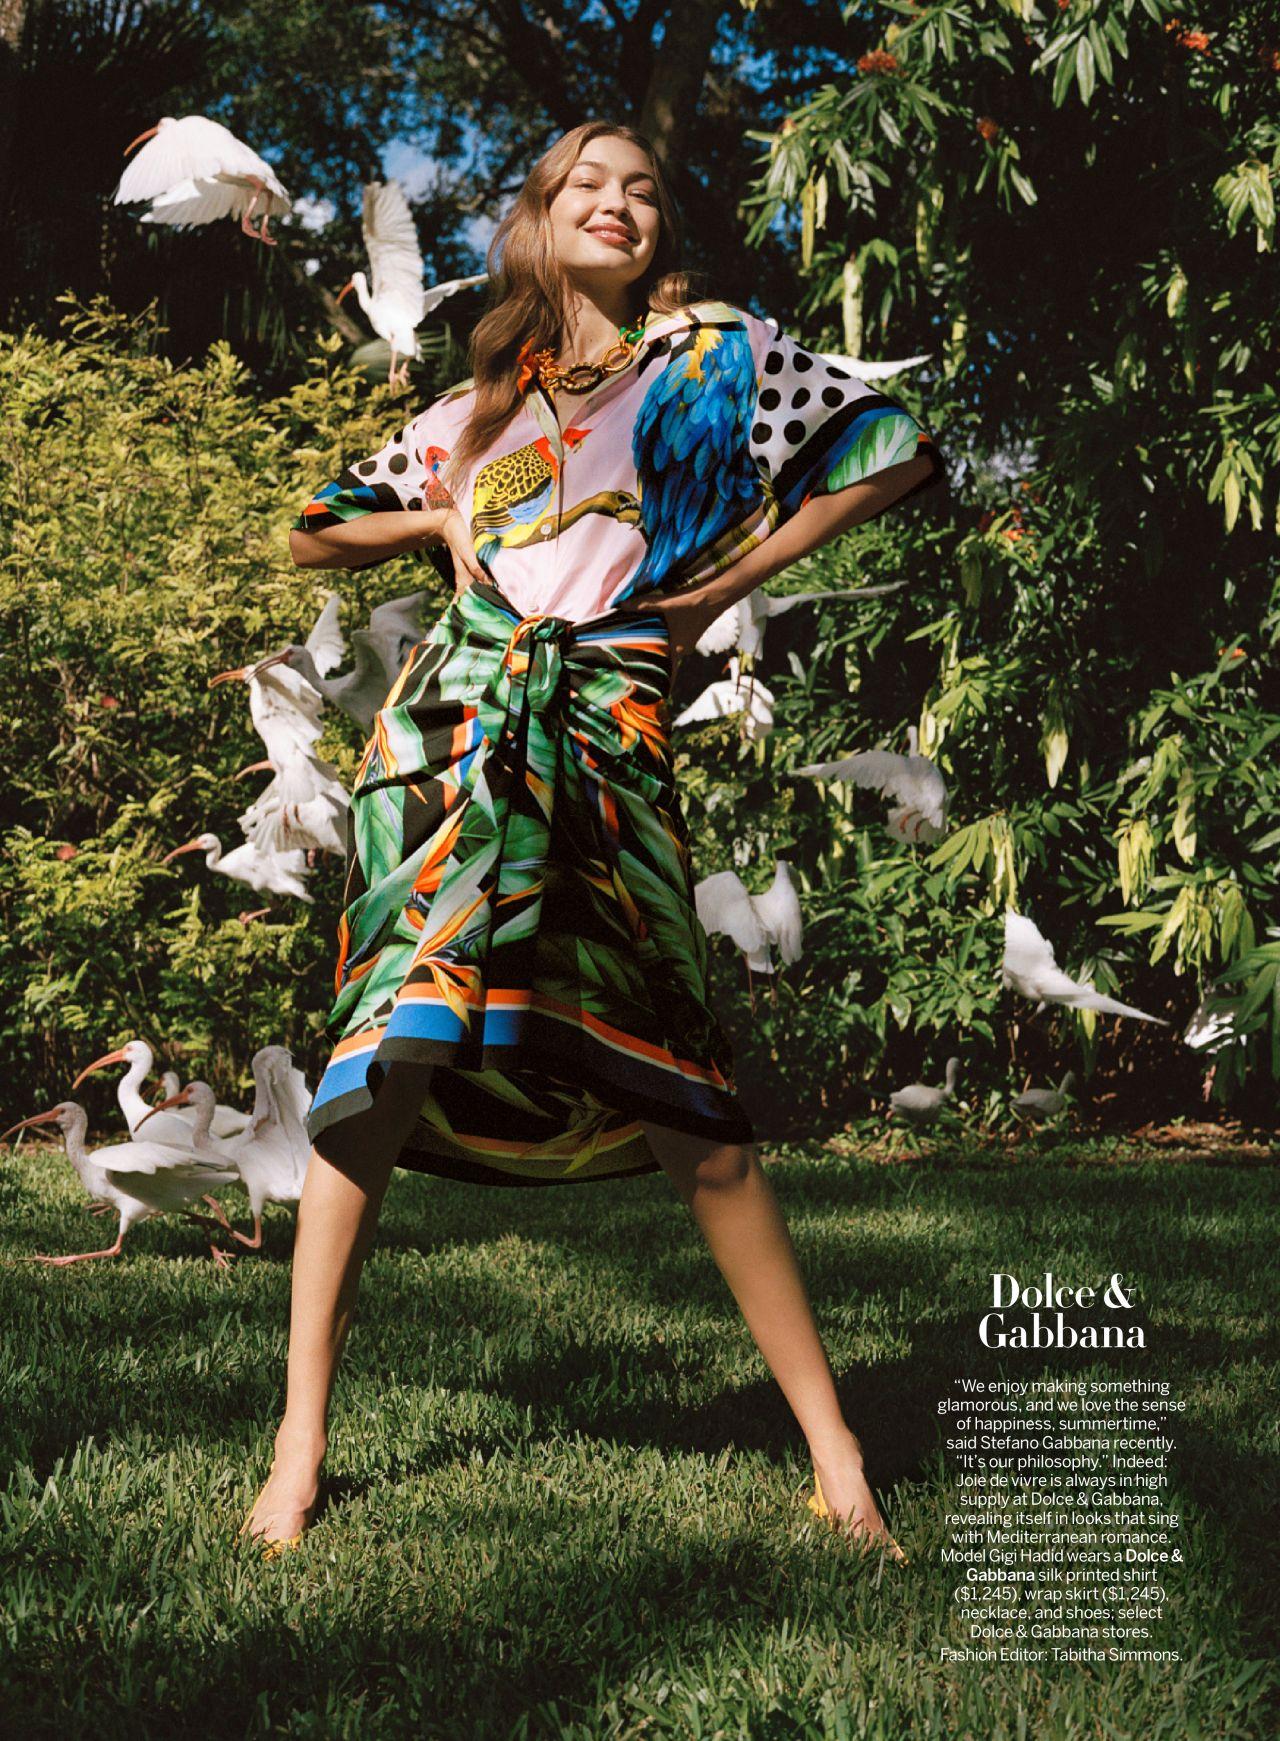 gigi-hadid-in-dolce-gabbana-vogue-magazine-january-2020-issue